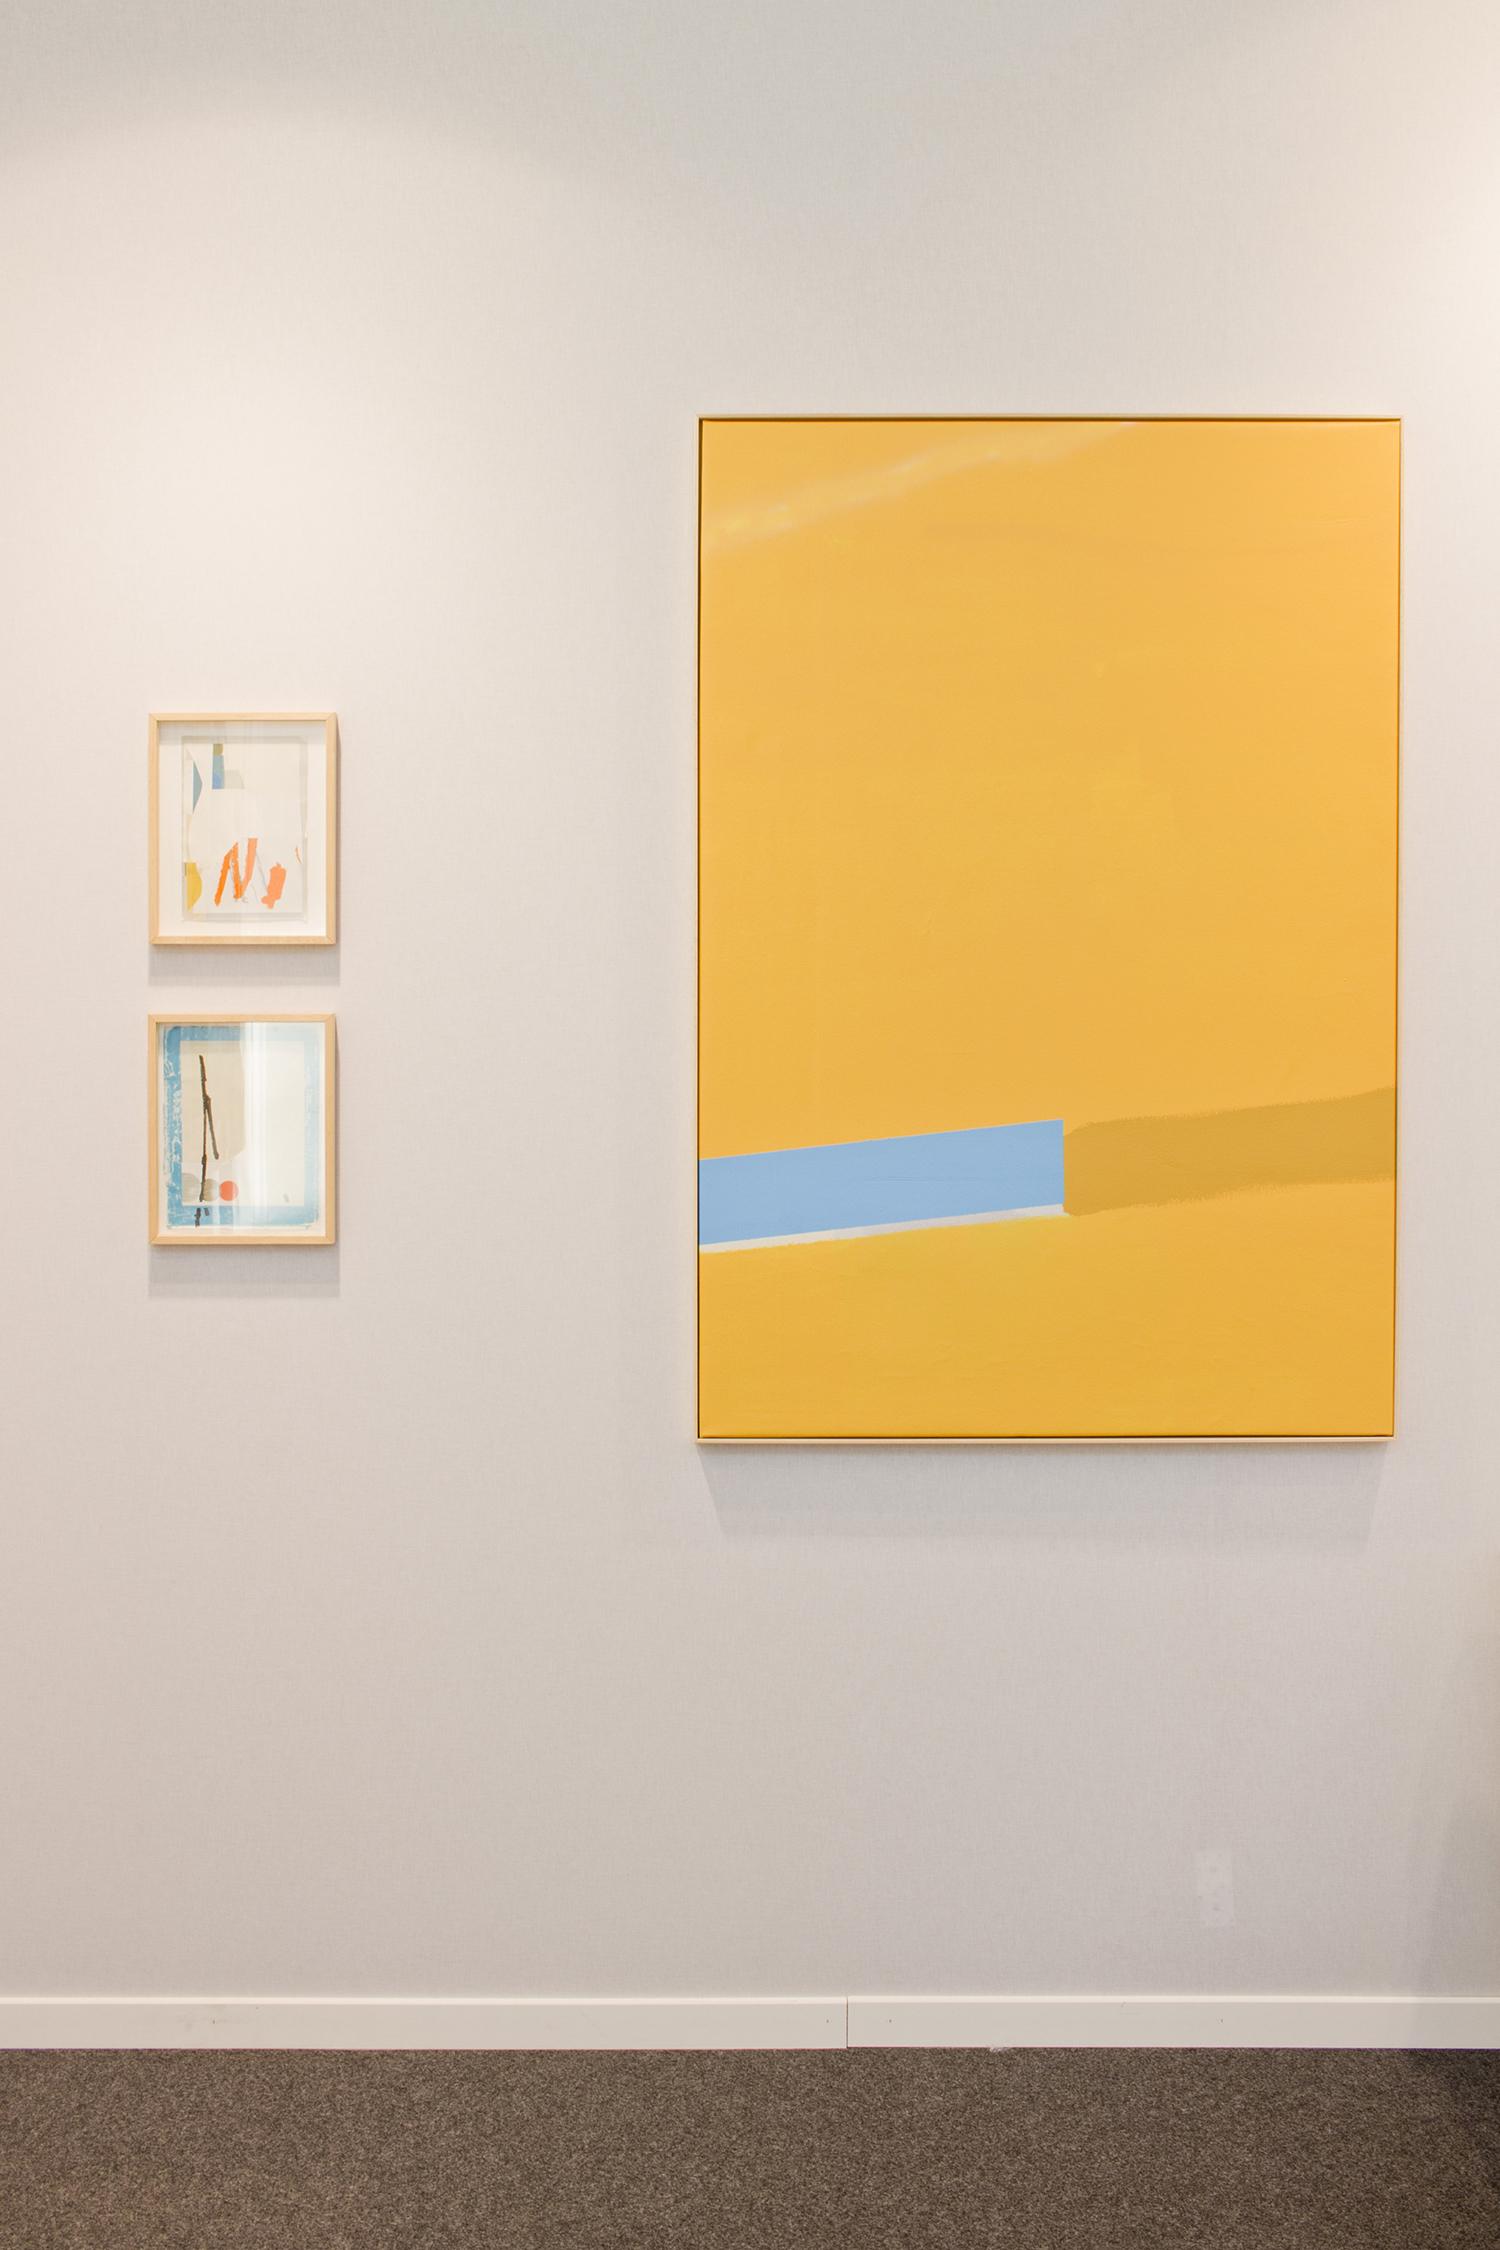 Joy of Destruction Ed Bats, Ekta, Nelio, Duncan Passmore e Zeser Galerie 42b